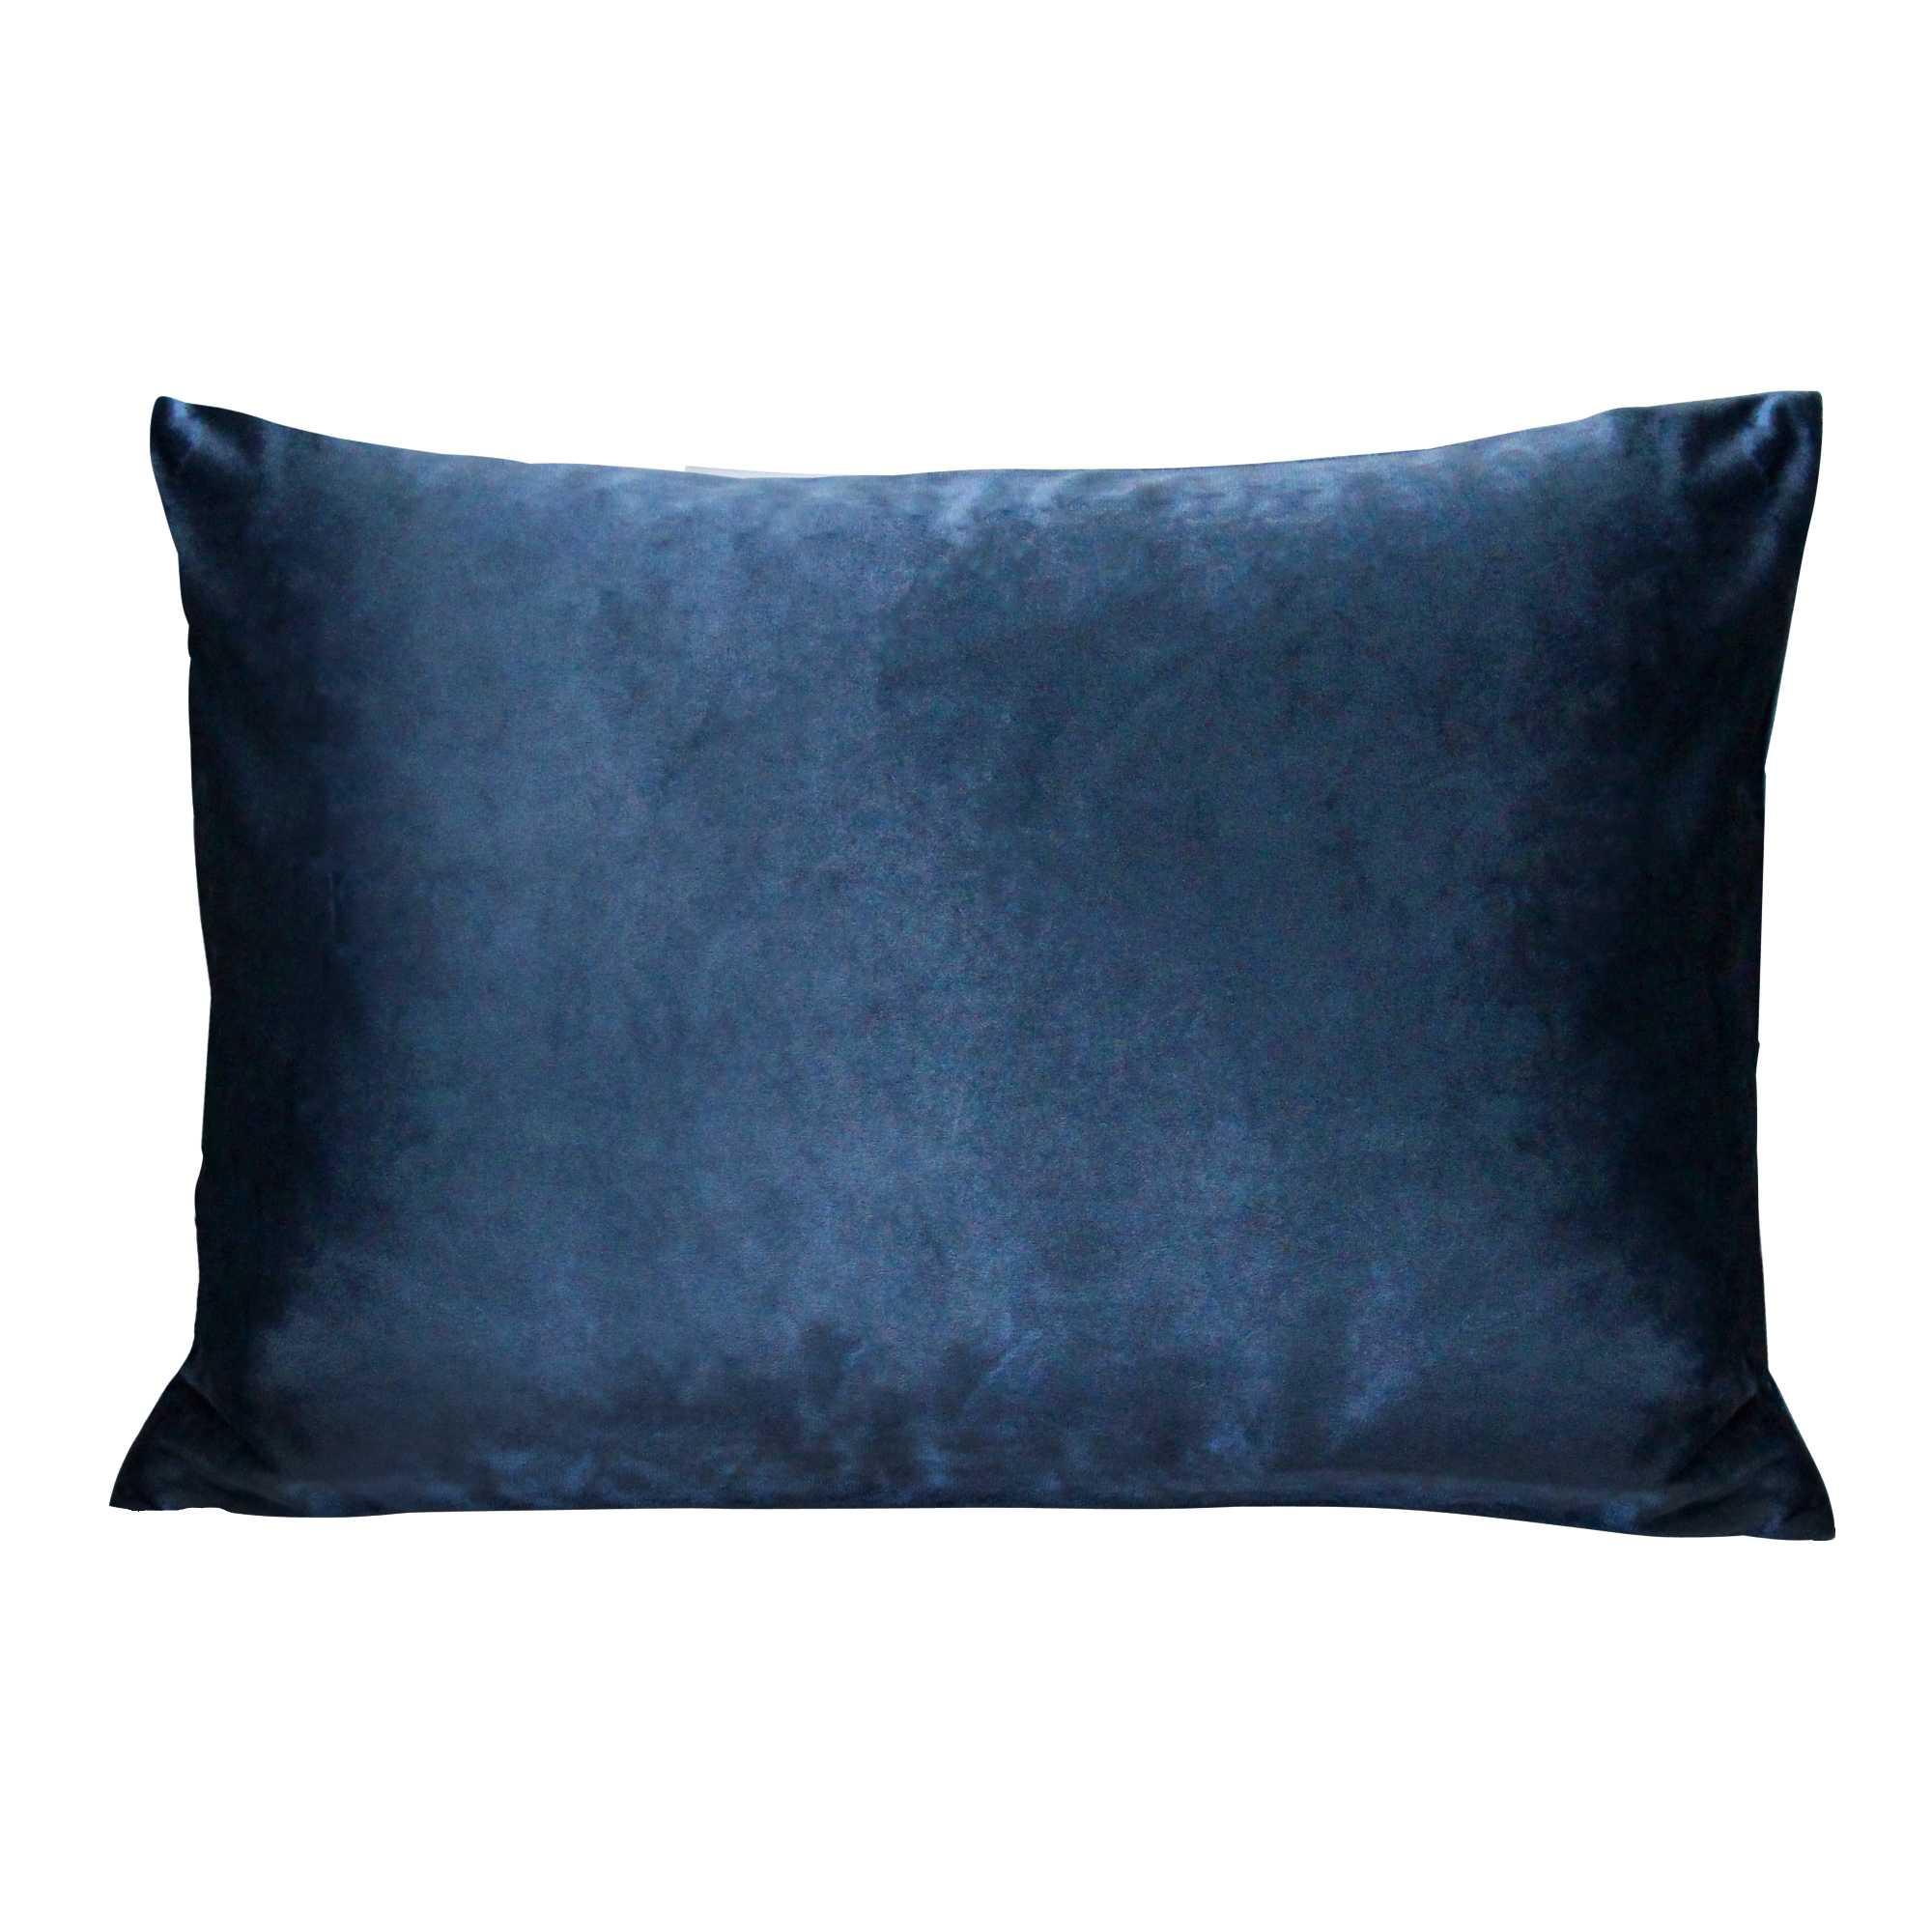 Royal Blue Velvet Indoor / Outdoor Lumbar Pillow